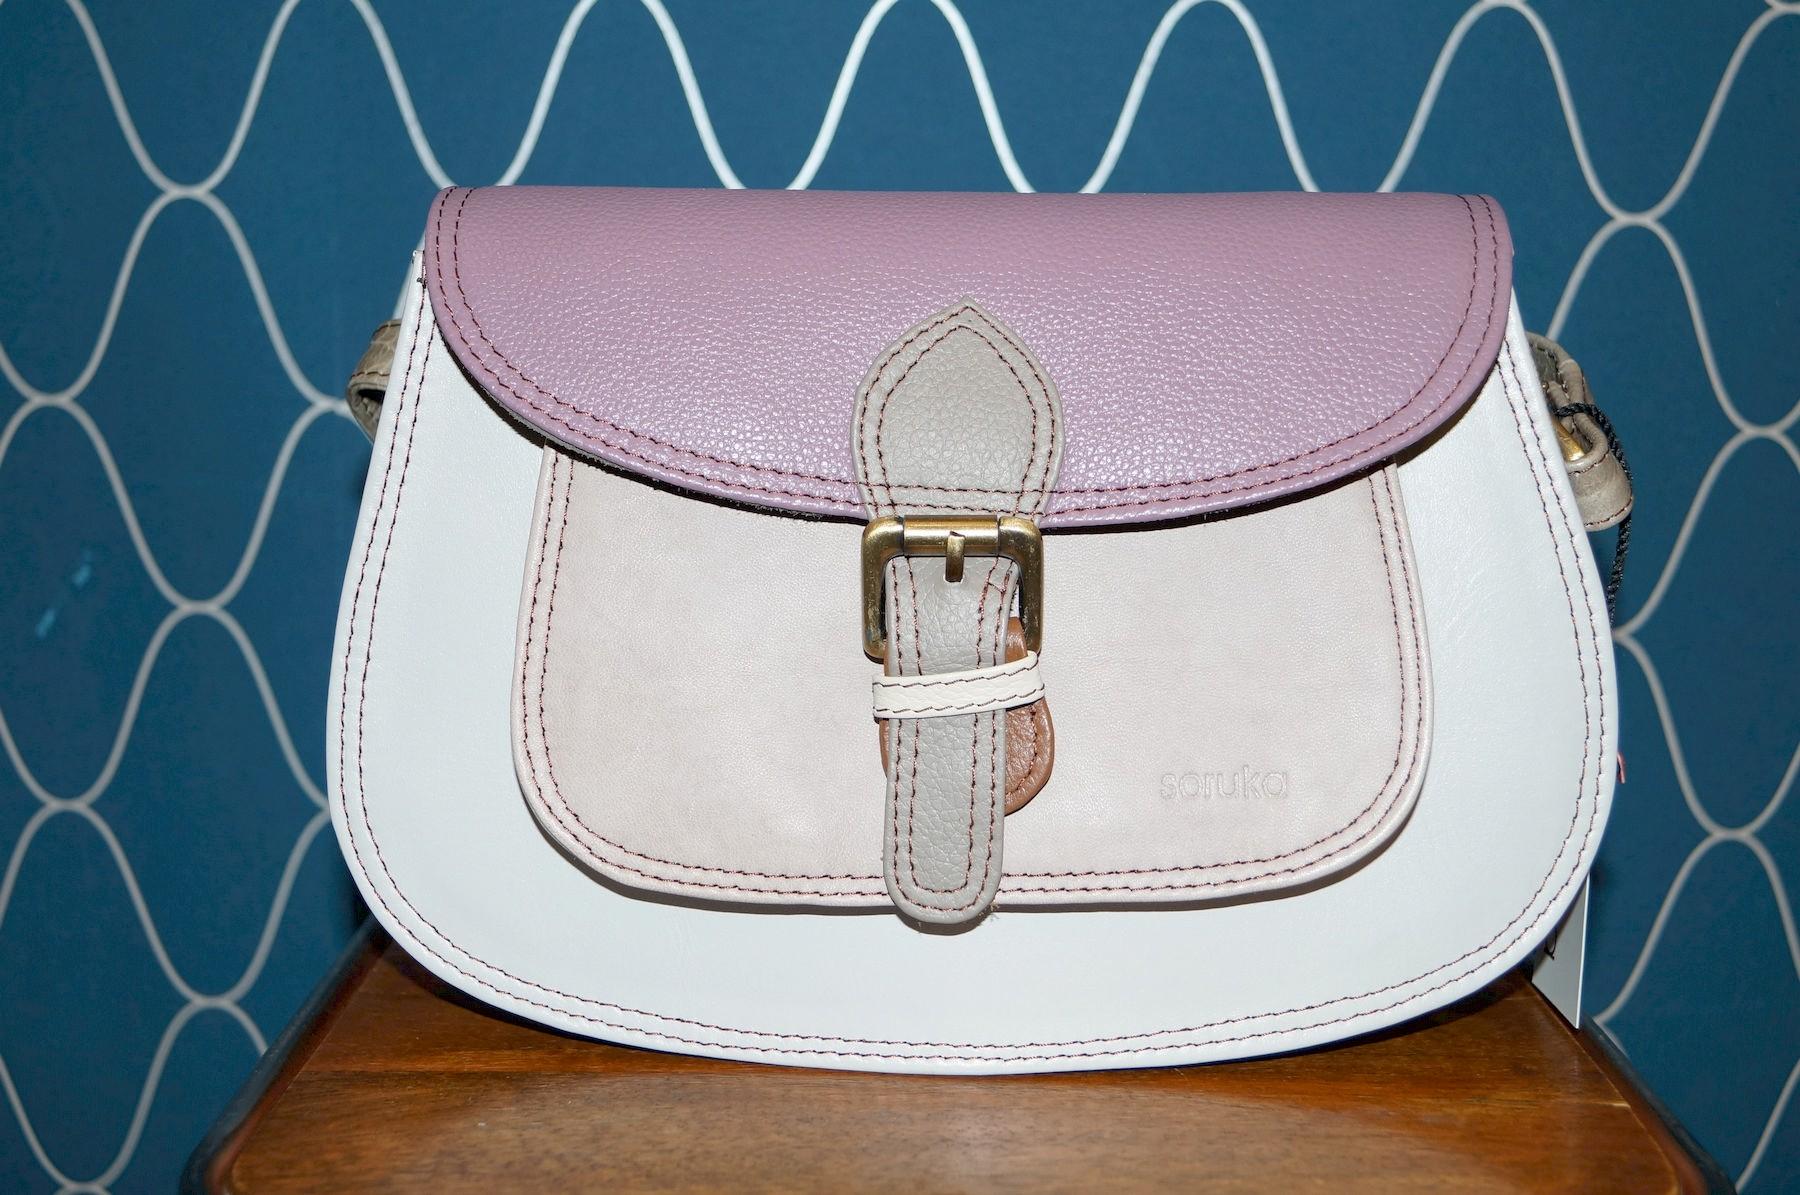 Soruka shoulder bag, round, purple flap